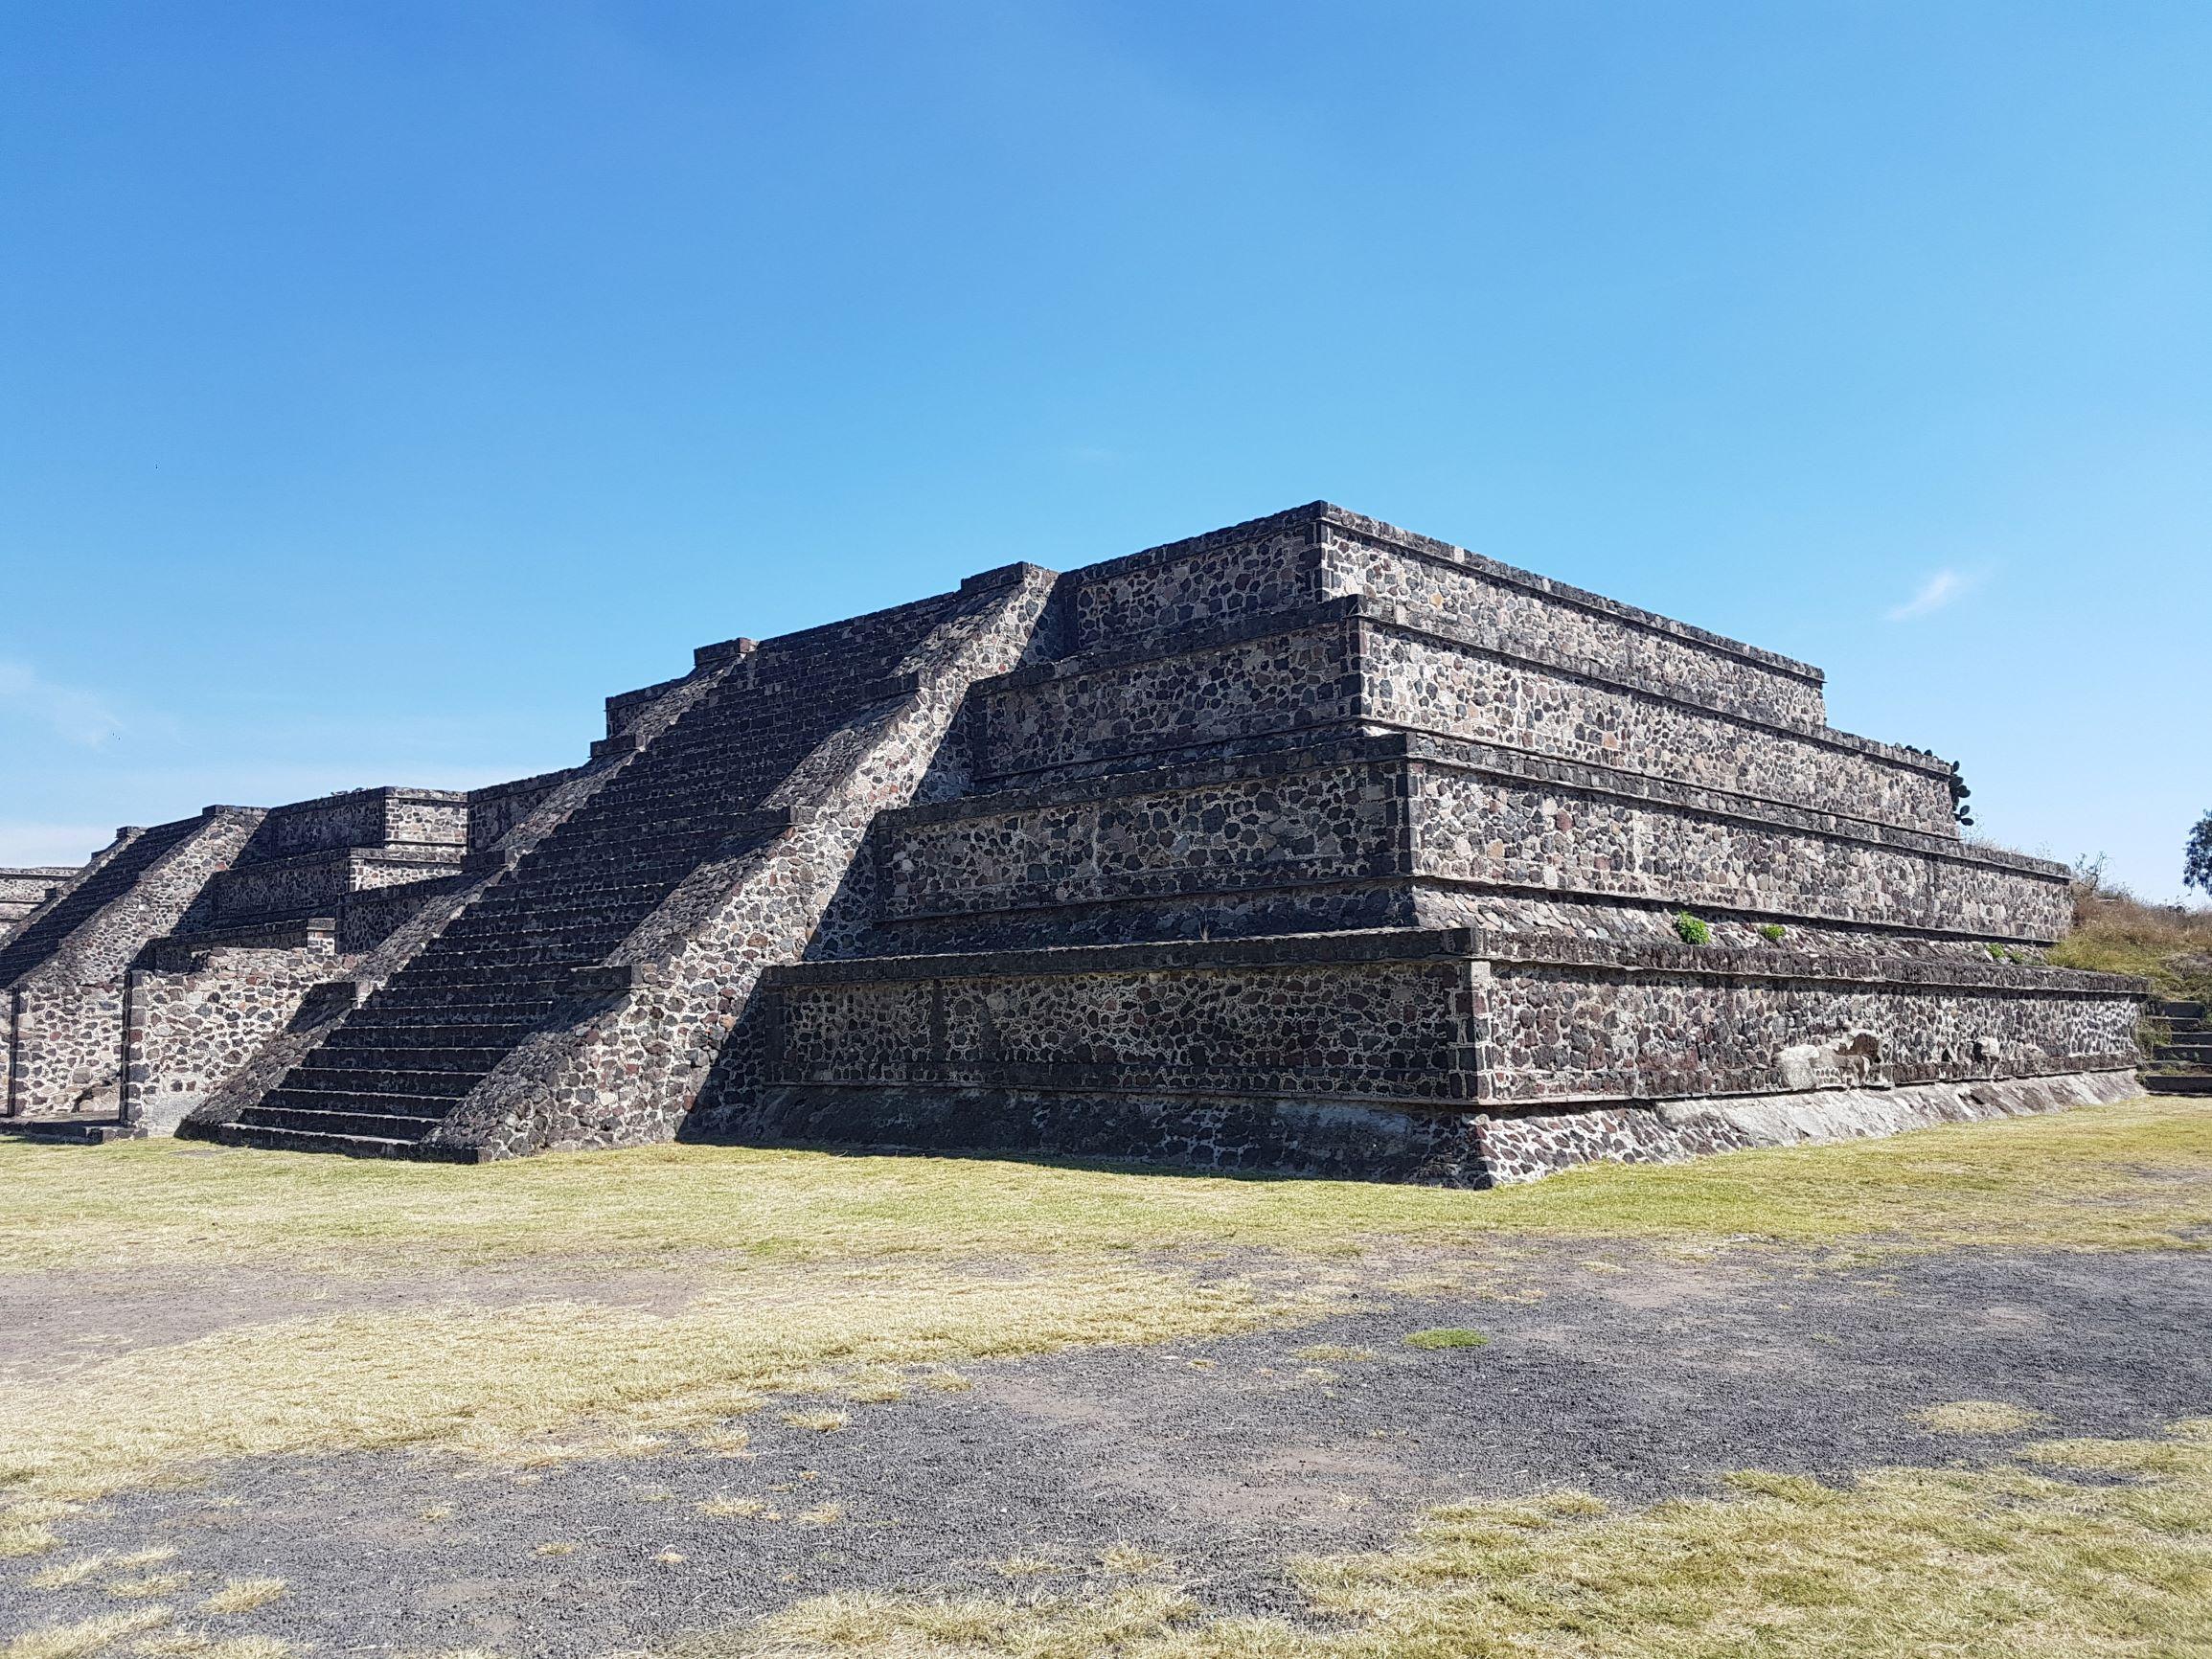 piramis2.jpg